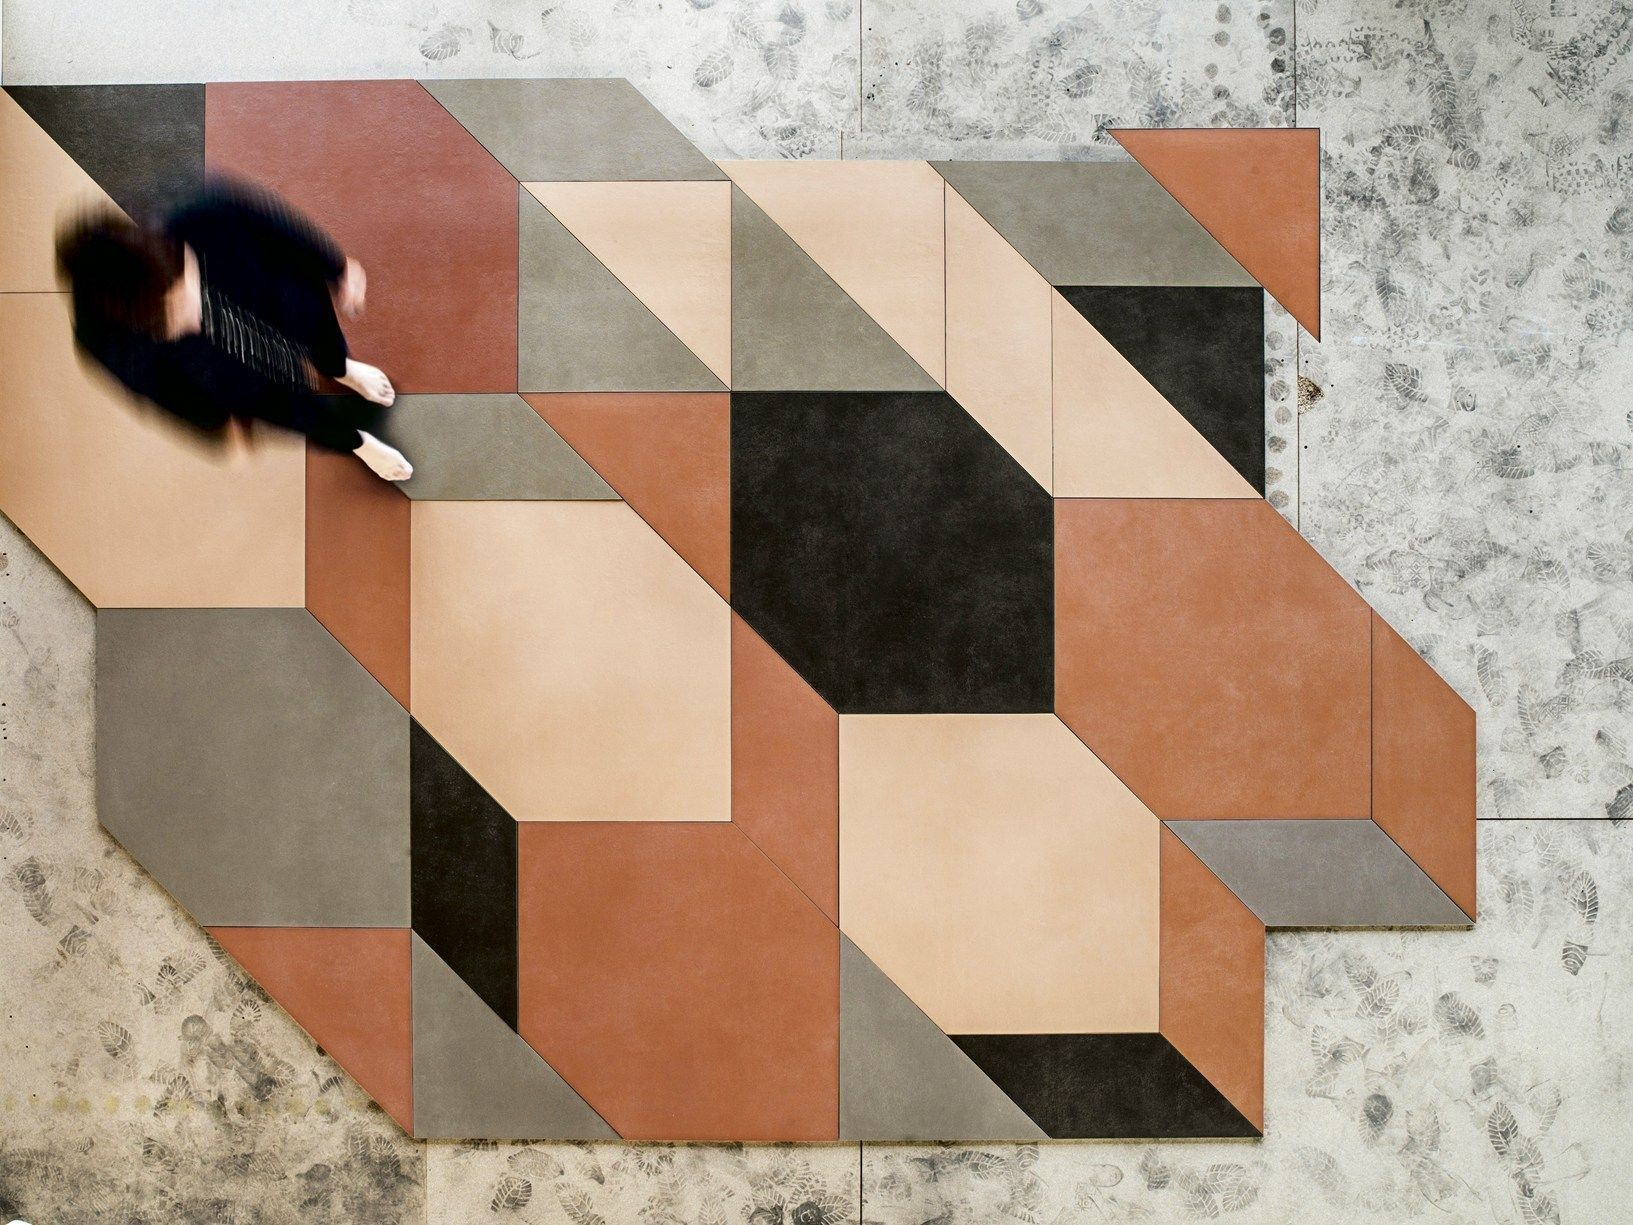 208 best Floor images on Pinterest | Arquitetura, Architecture ...